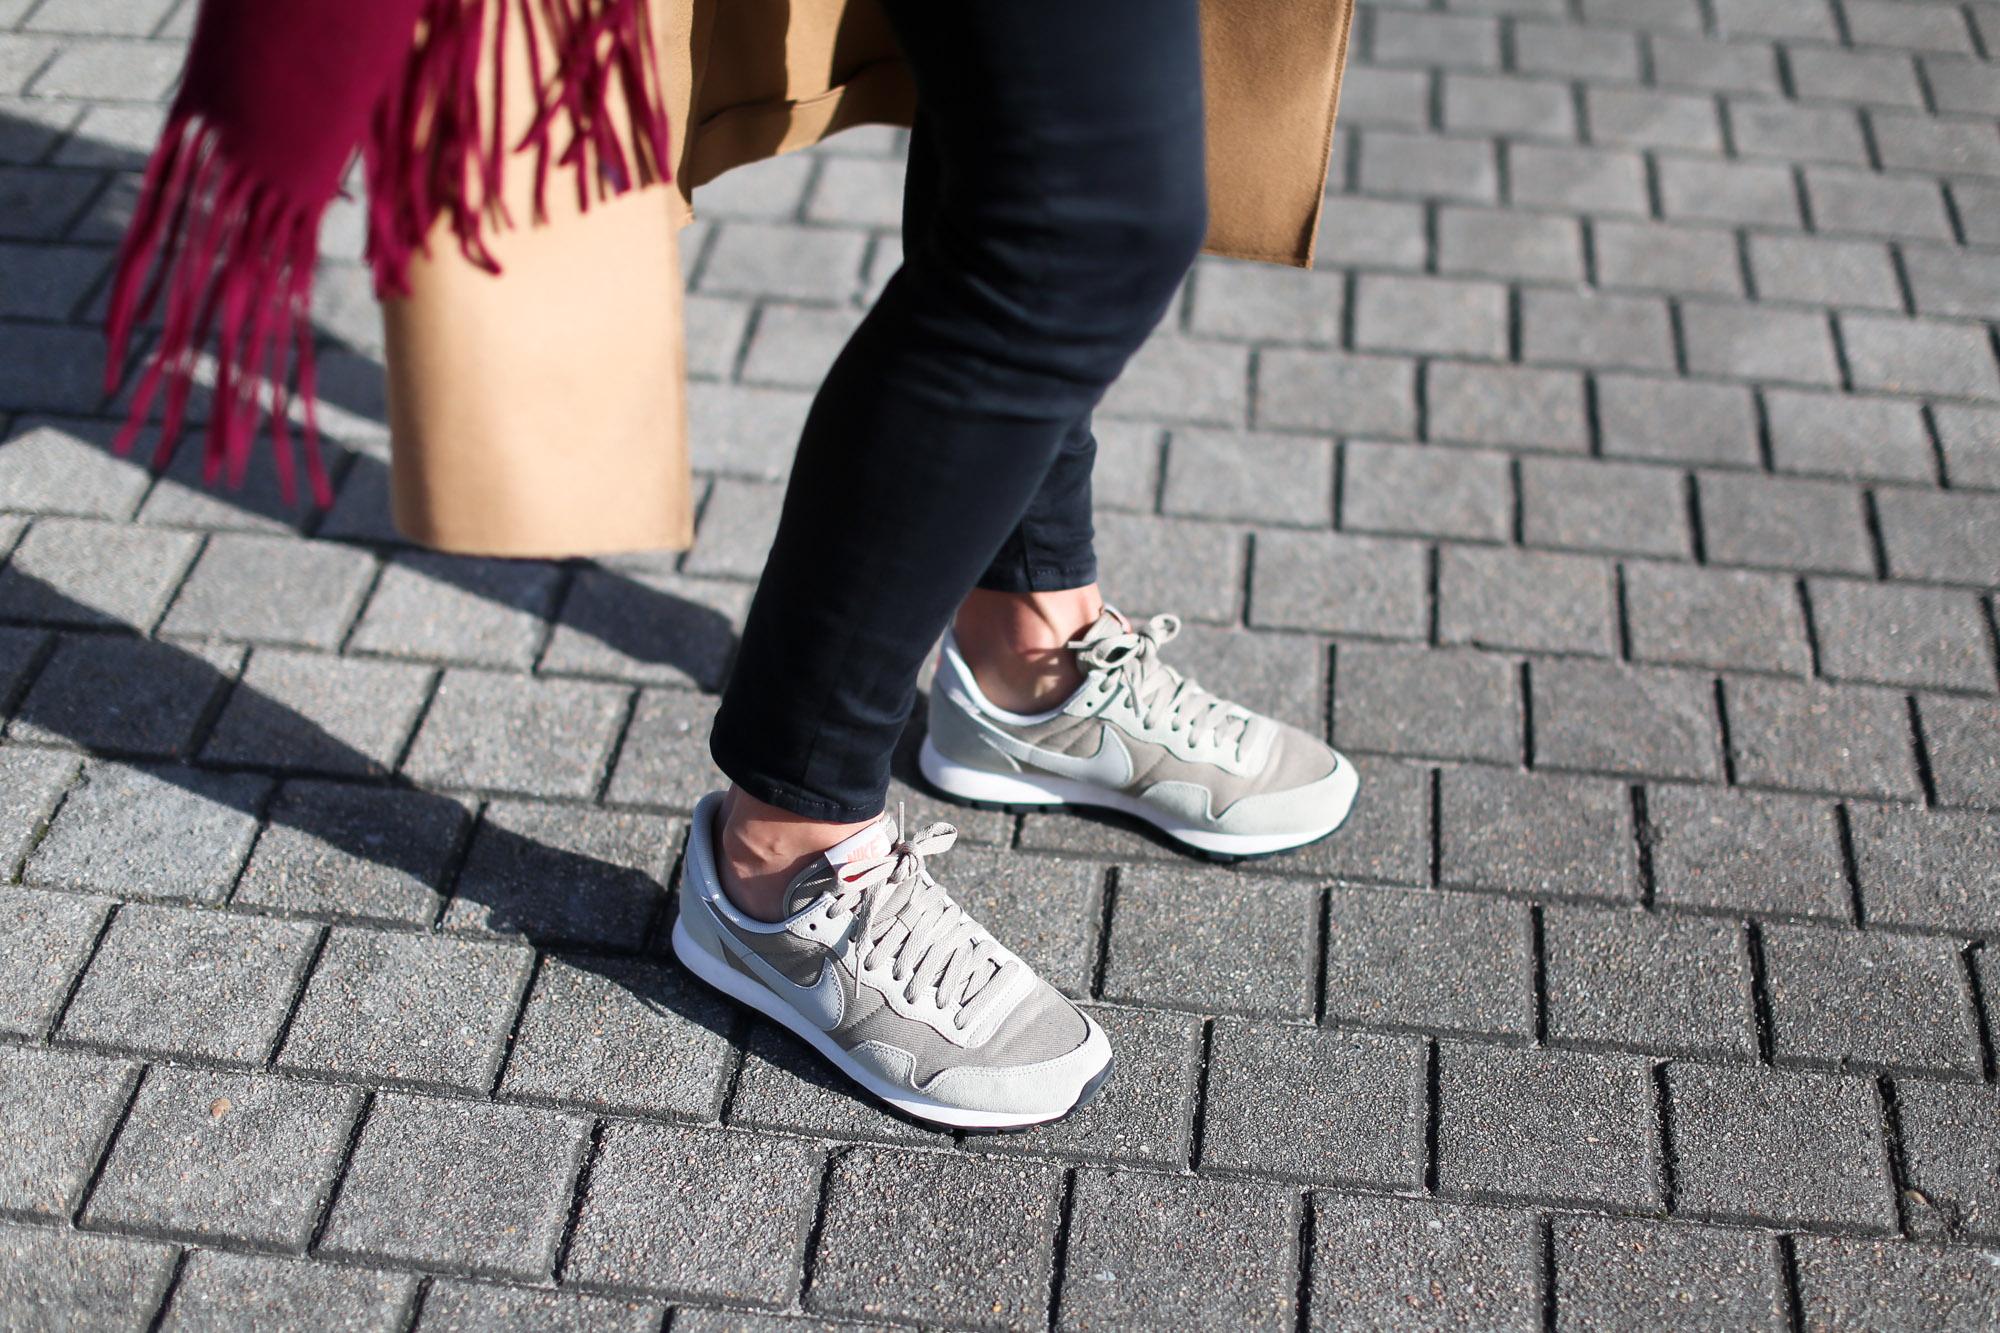 Clochet_streestyle_fashionblogger_&otherstories_abrigocamel_nikepegasus_topshopjamiejeans-8